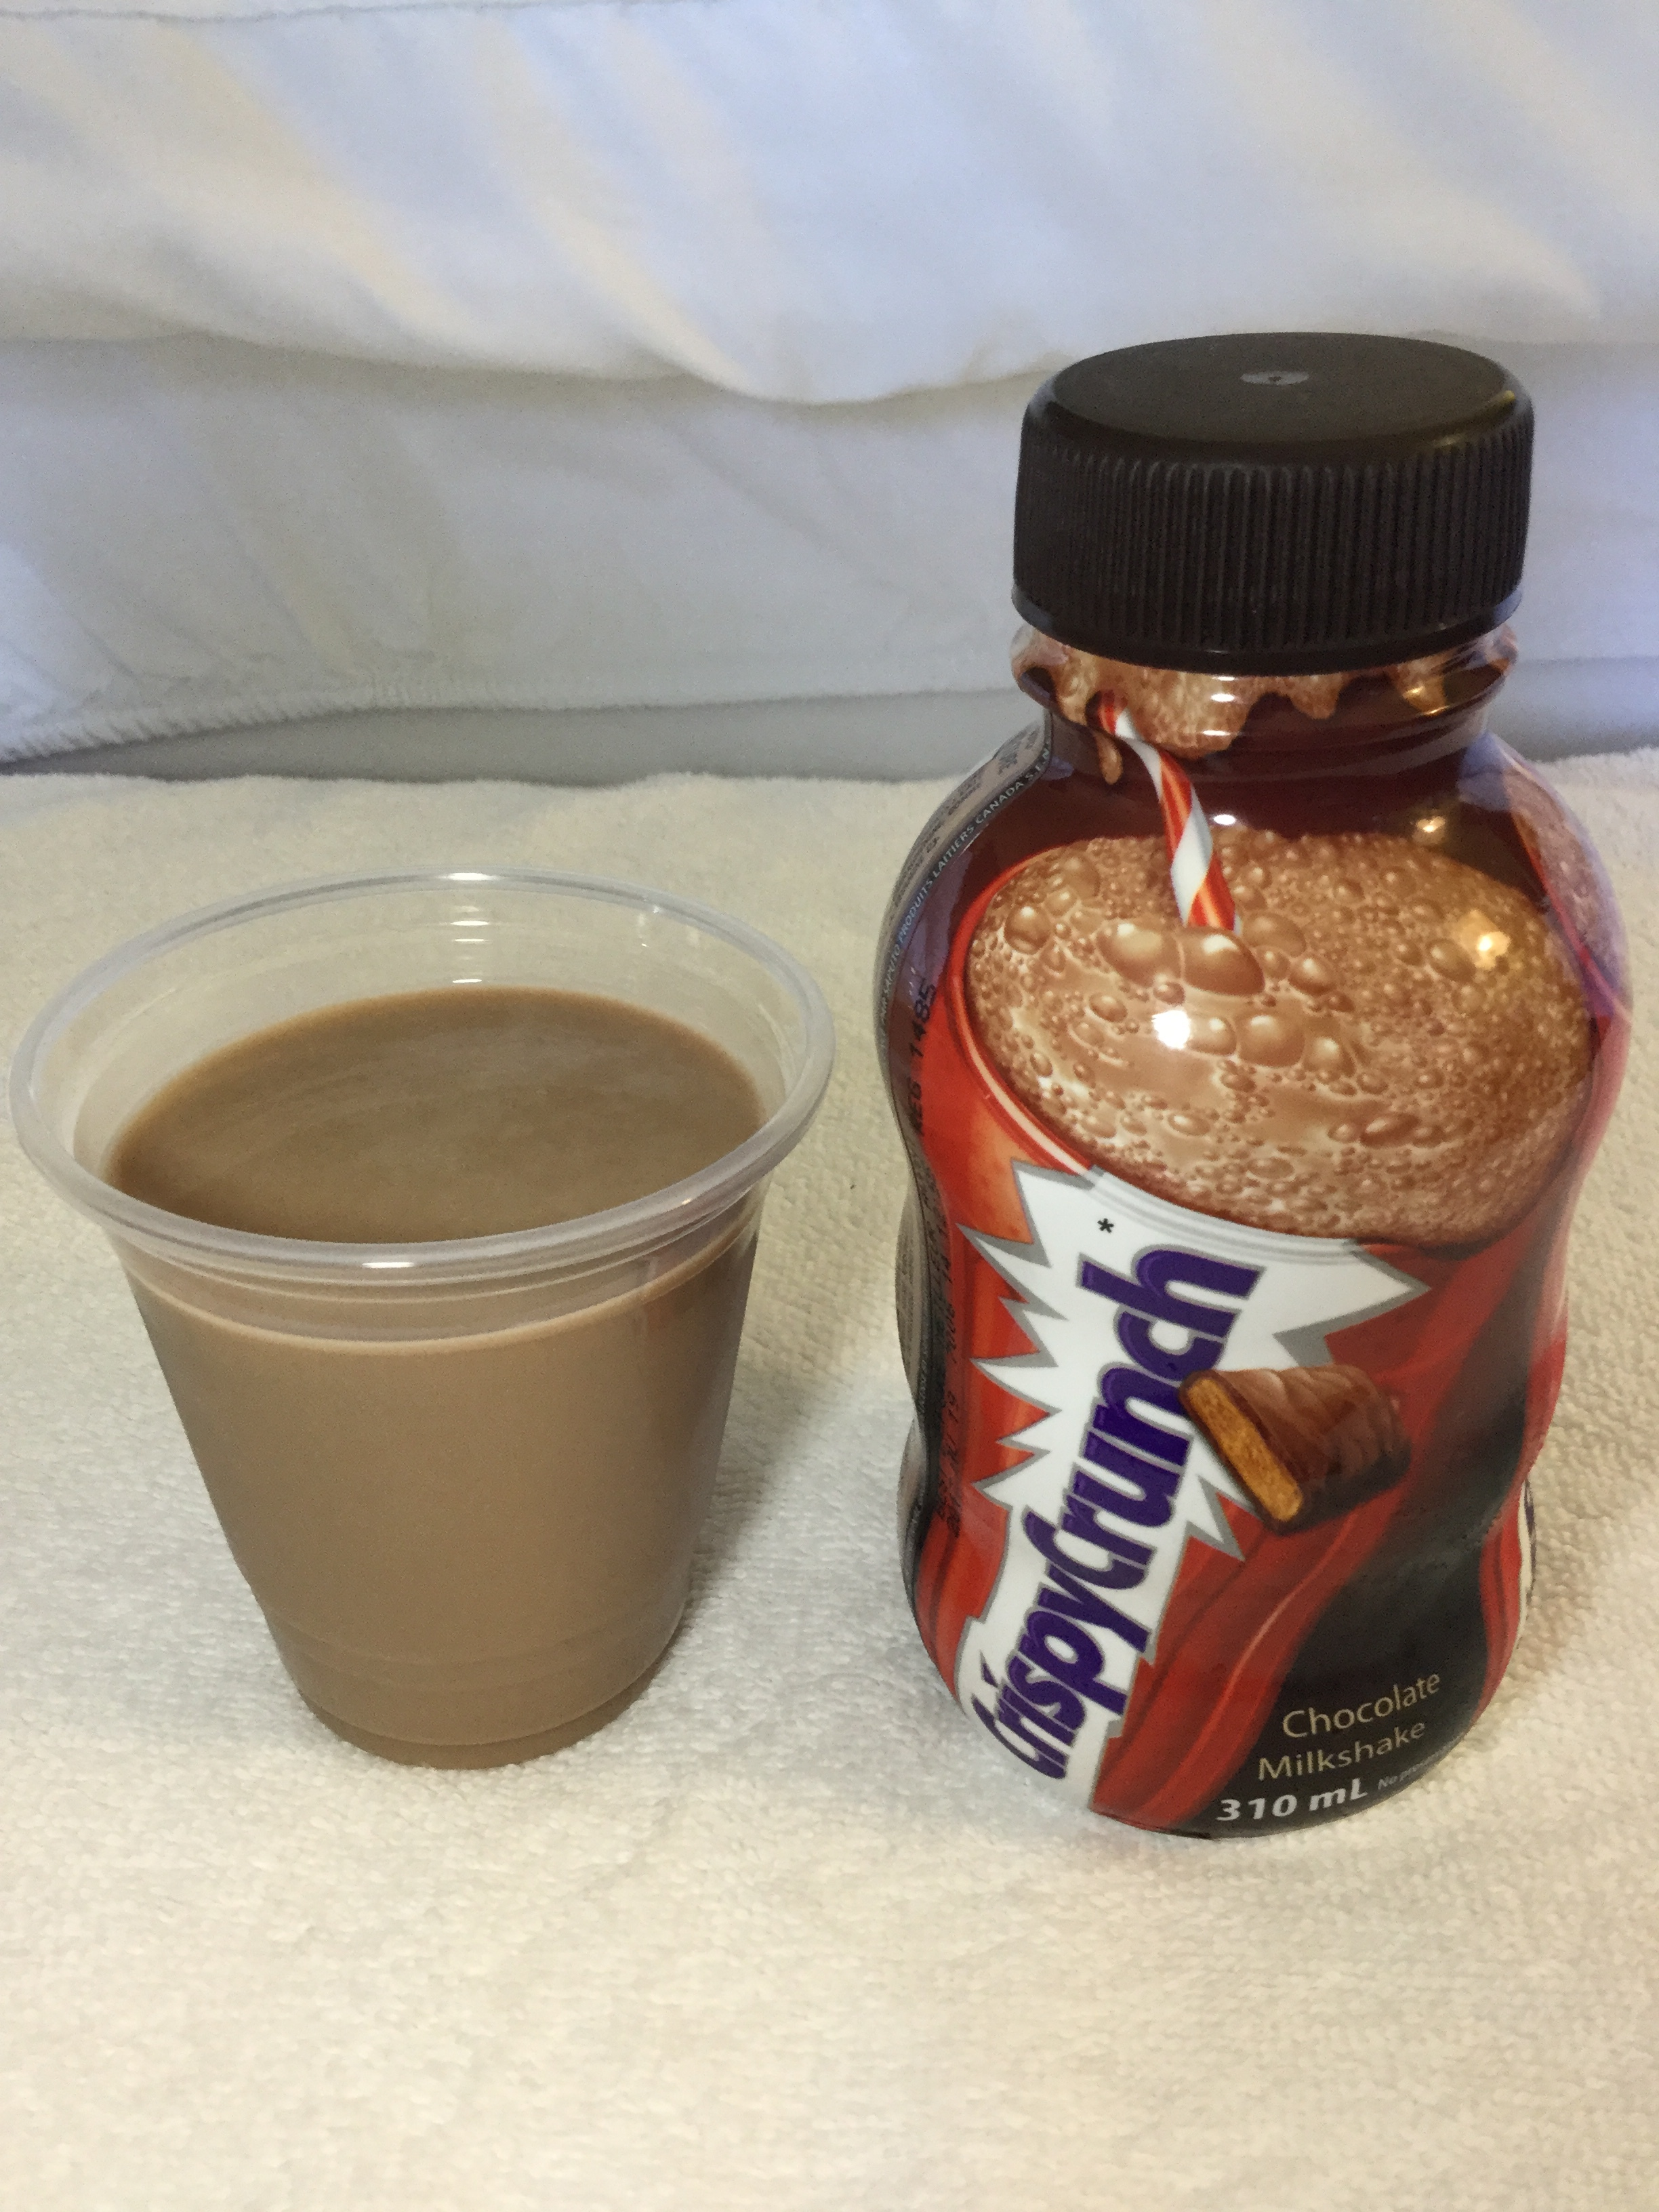 Saputo Crispy Crunch Chocolate Milkshake Cup